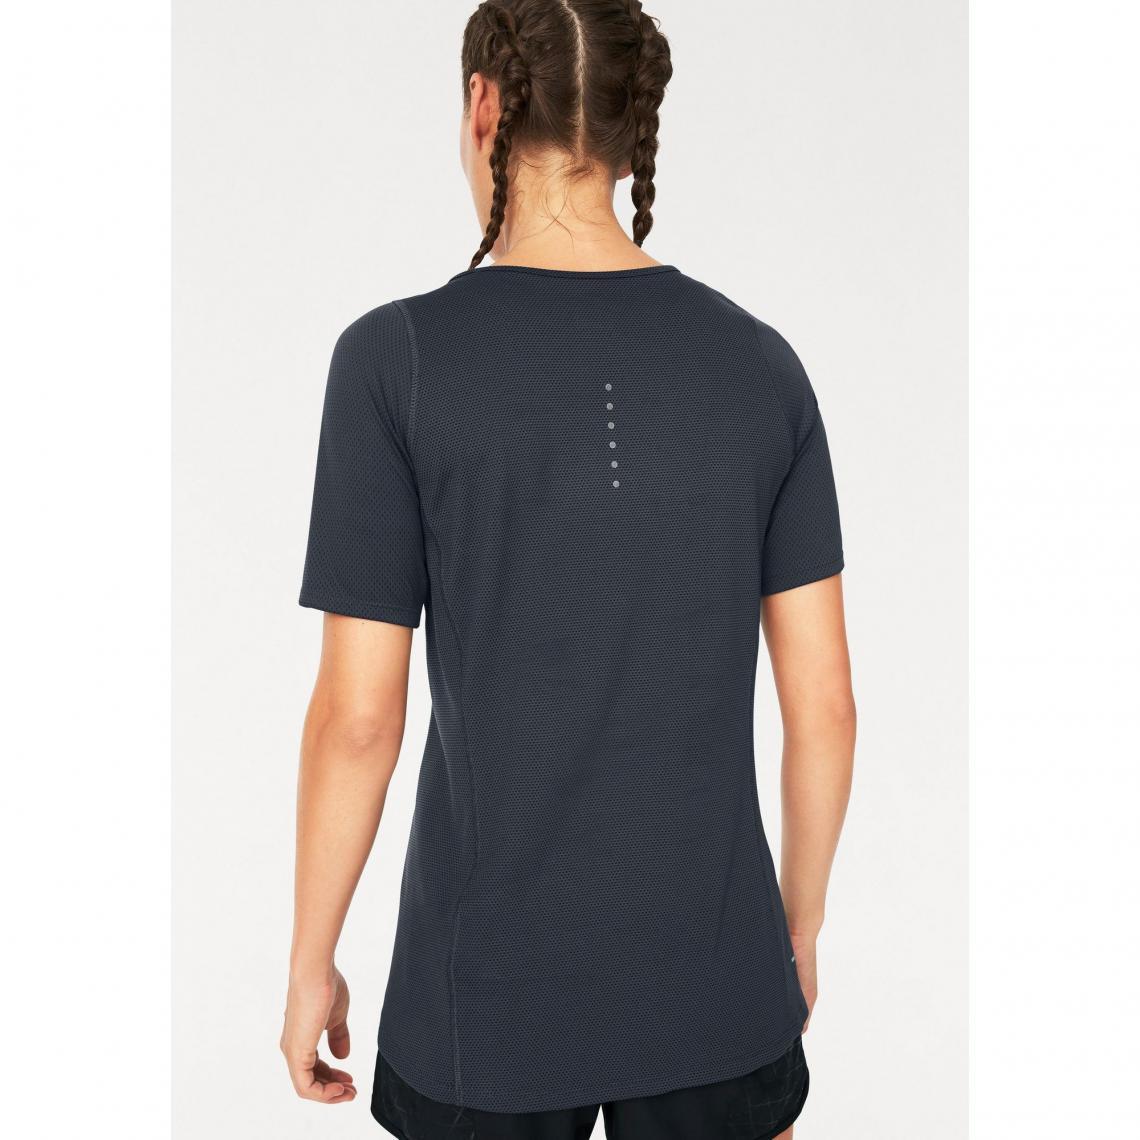 Tee-shirt de sport manches courtes femme Dri-FIT ZNL Classic Relay ... aff37fd96ca